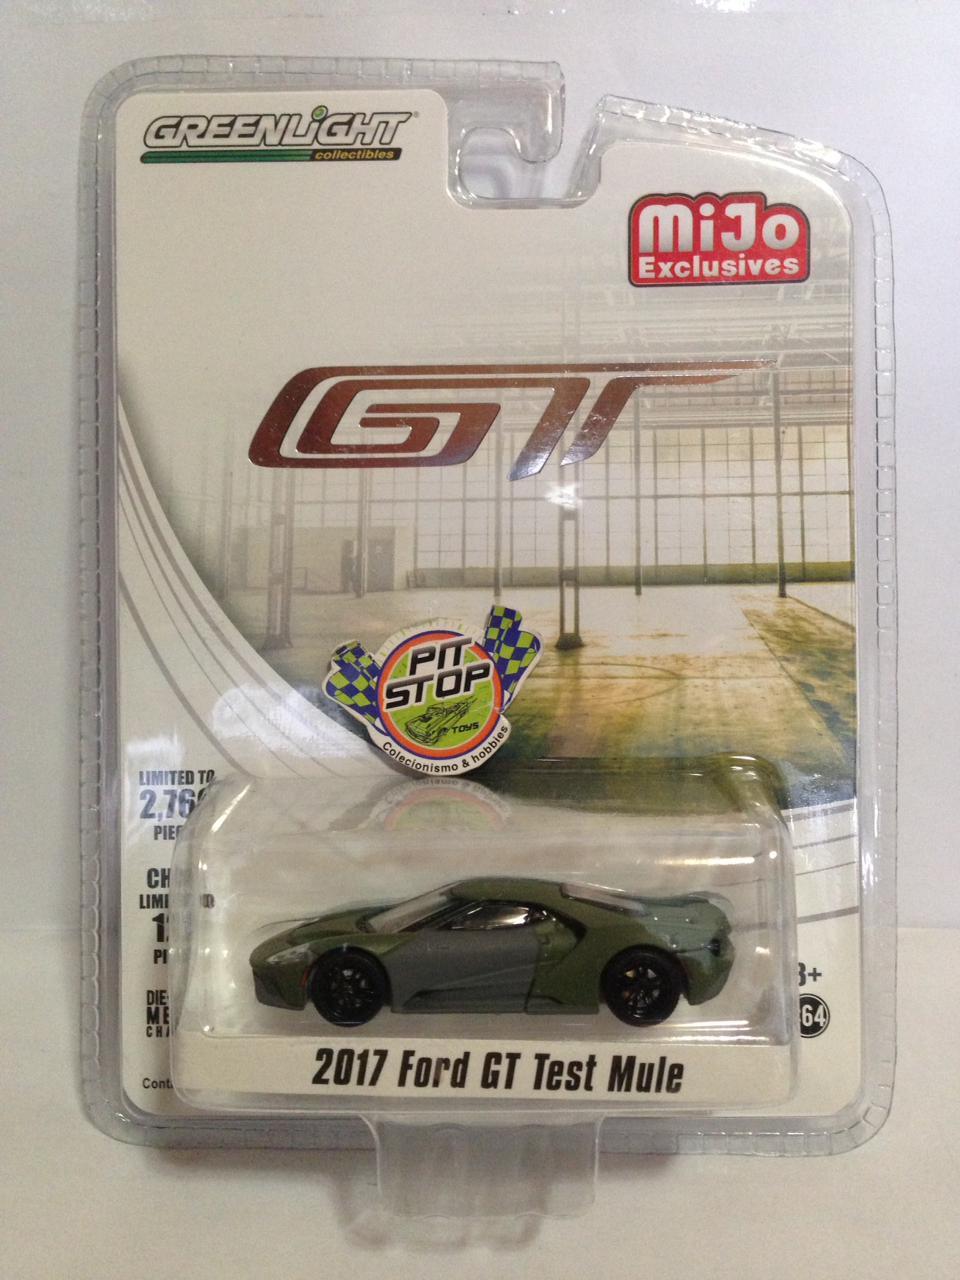 Greenlight - 2017 Ford GT Teste Mule Verde - GT - MiJo Exclusives - Limitado em 2760 pcs